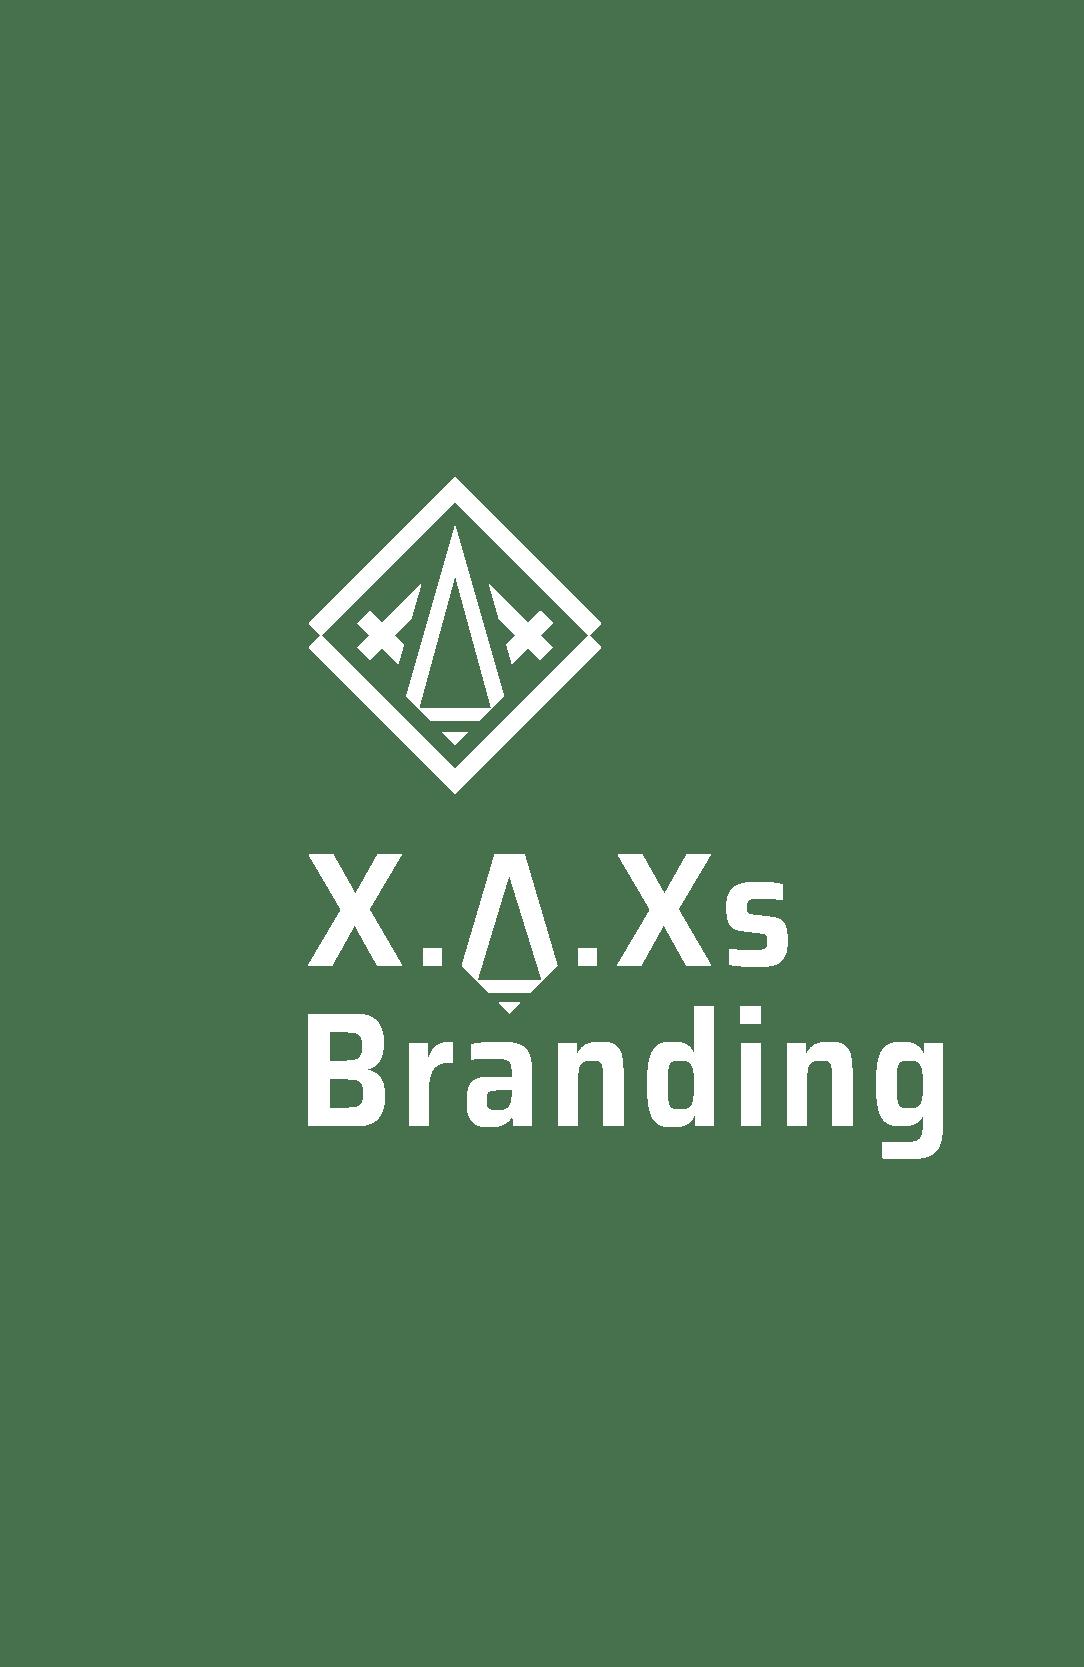 XAXs branding heading